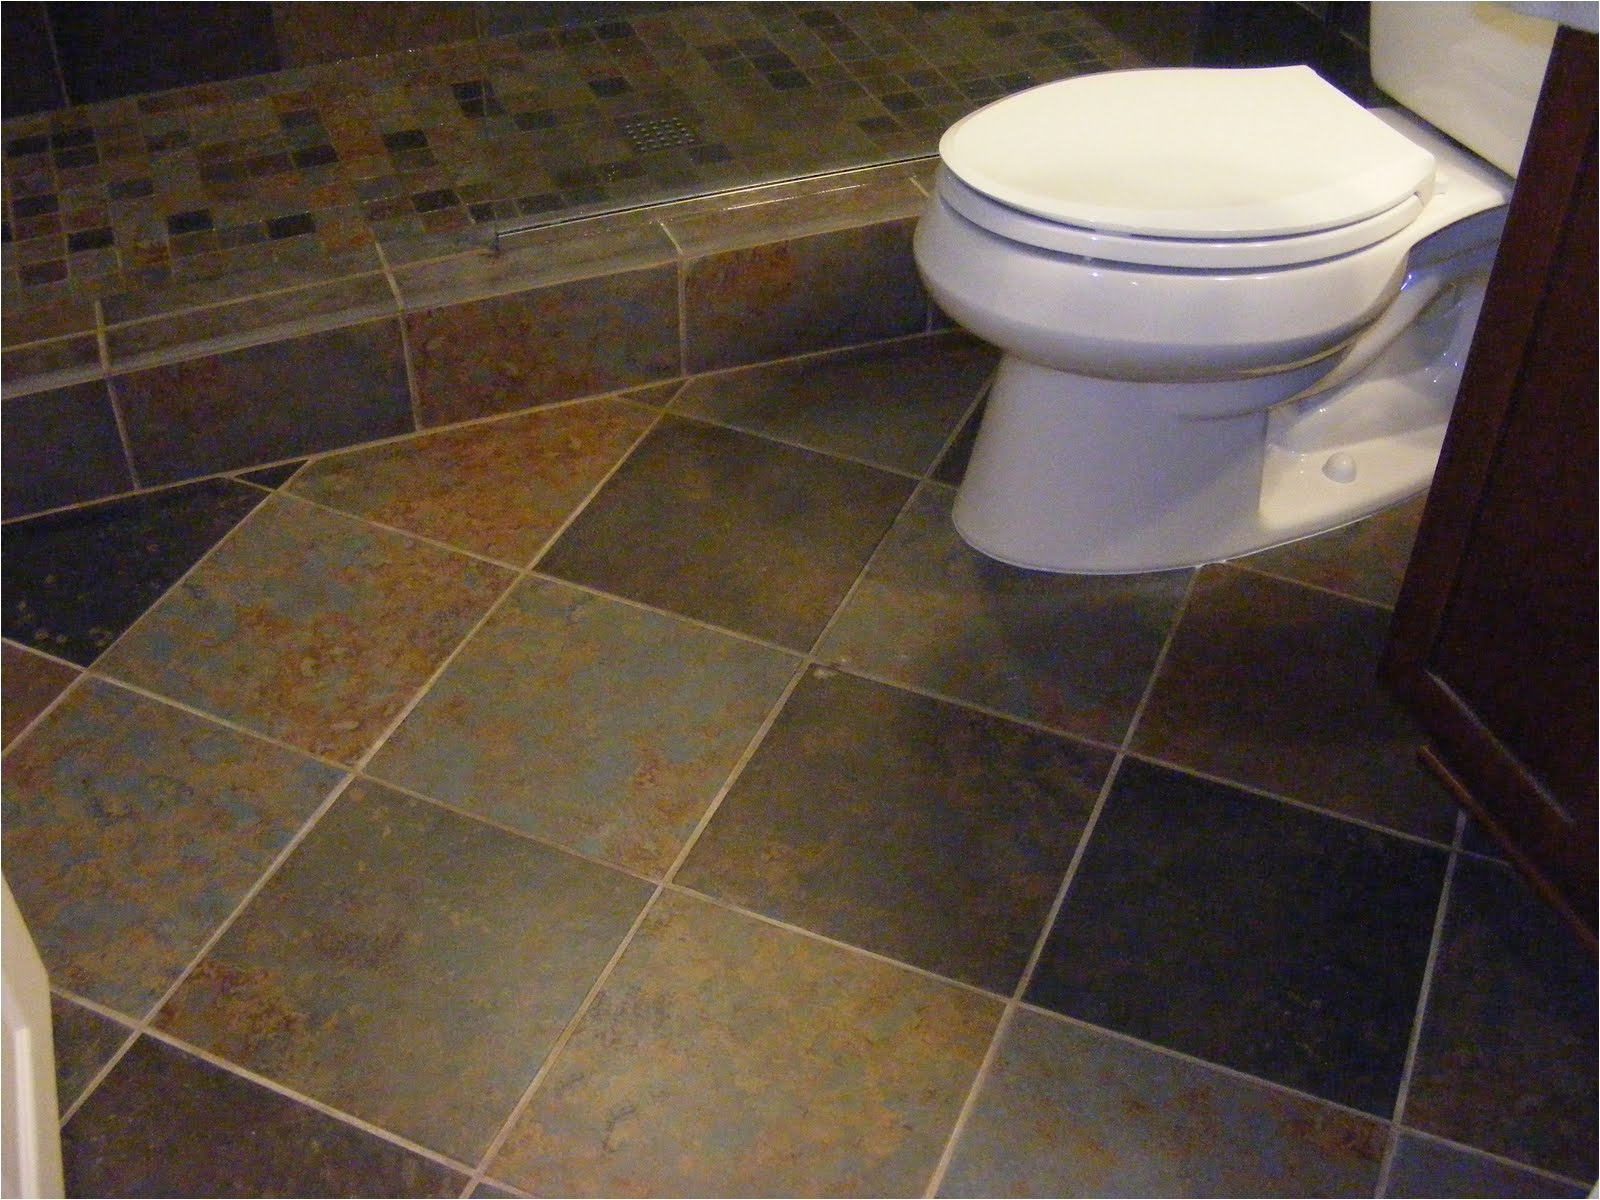 Best Grout Color for Shower Floor Cute Small Bathroom Flooring Ideas 3 Amazing Floors for Bathrooms